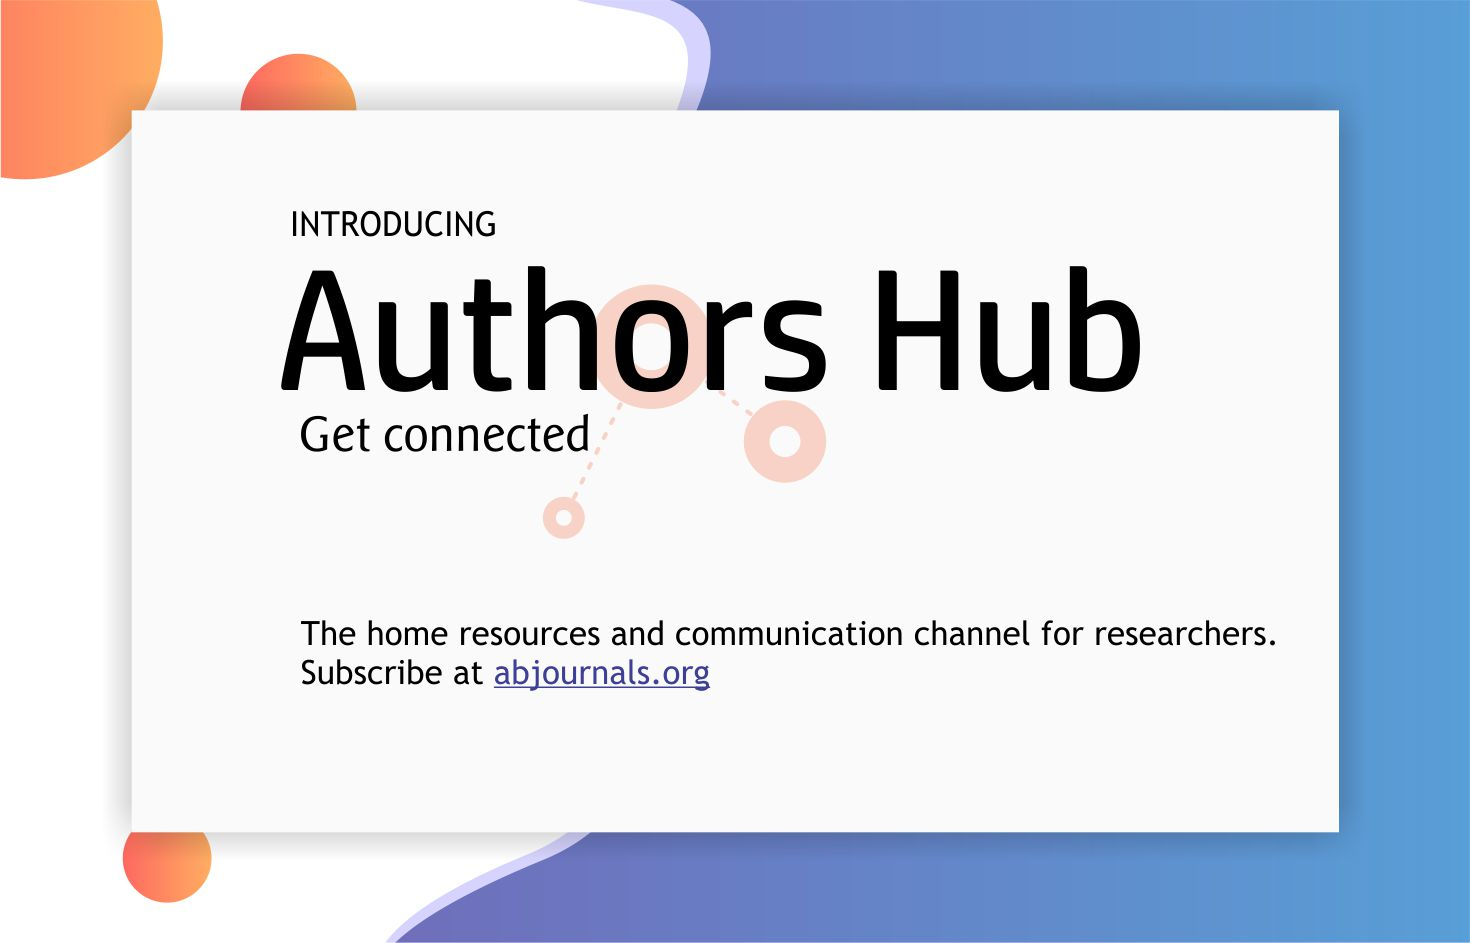 Introducing Authors Hub